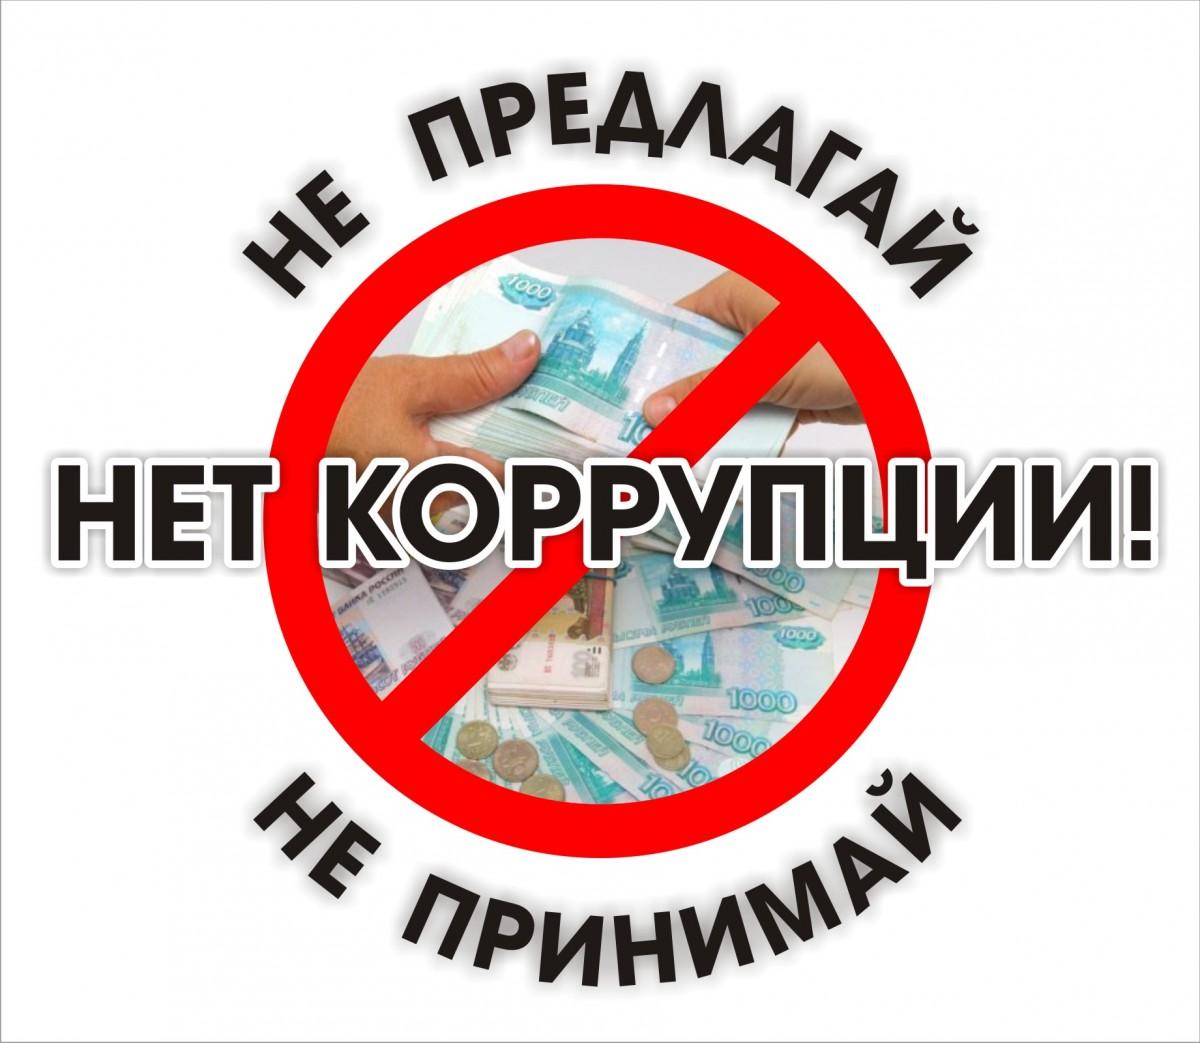 картинка вместе против коррупции кухни